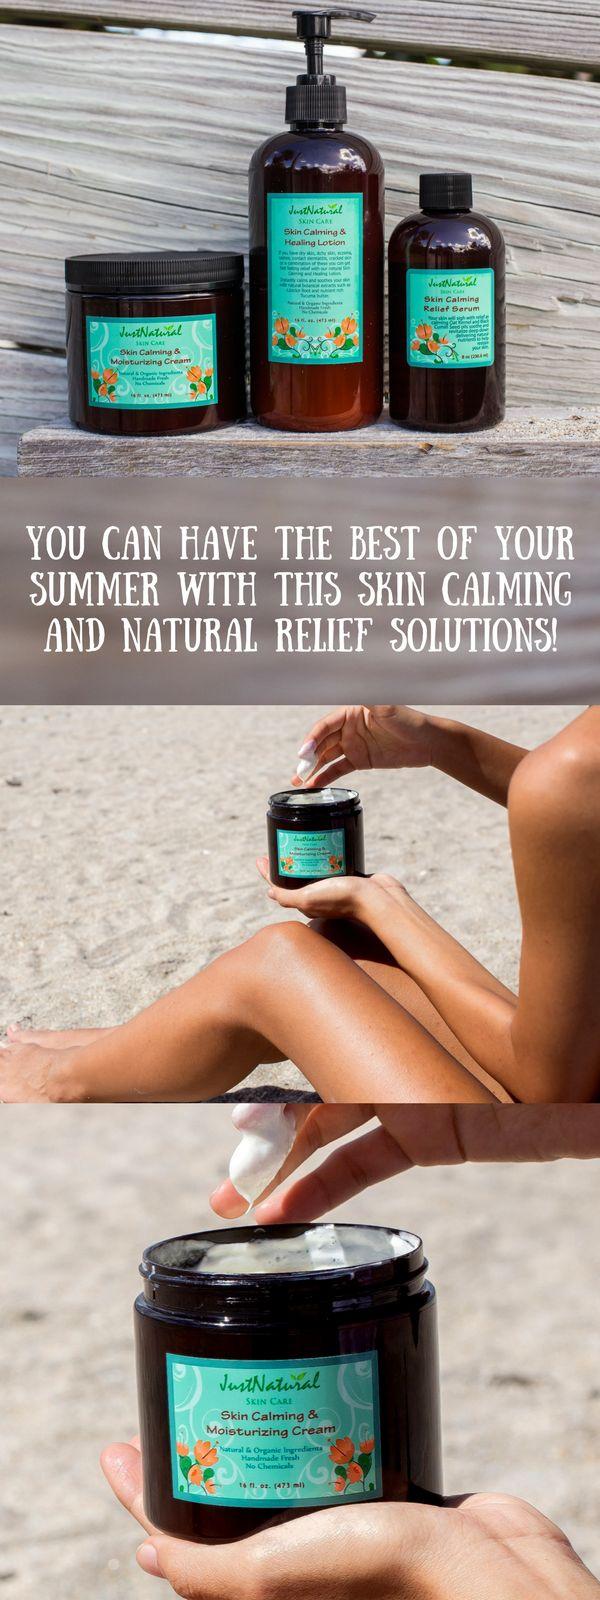 Healthy skin is always IN!! http://shedonteversleep.tumblr.com/post/157435310468/more